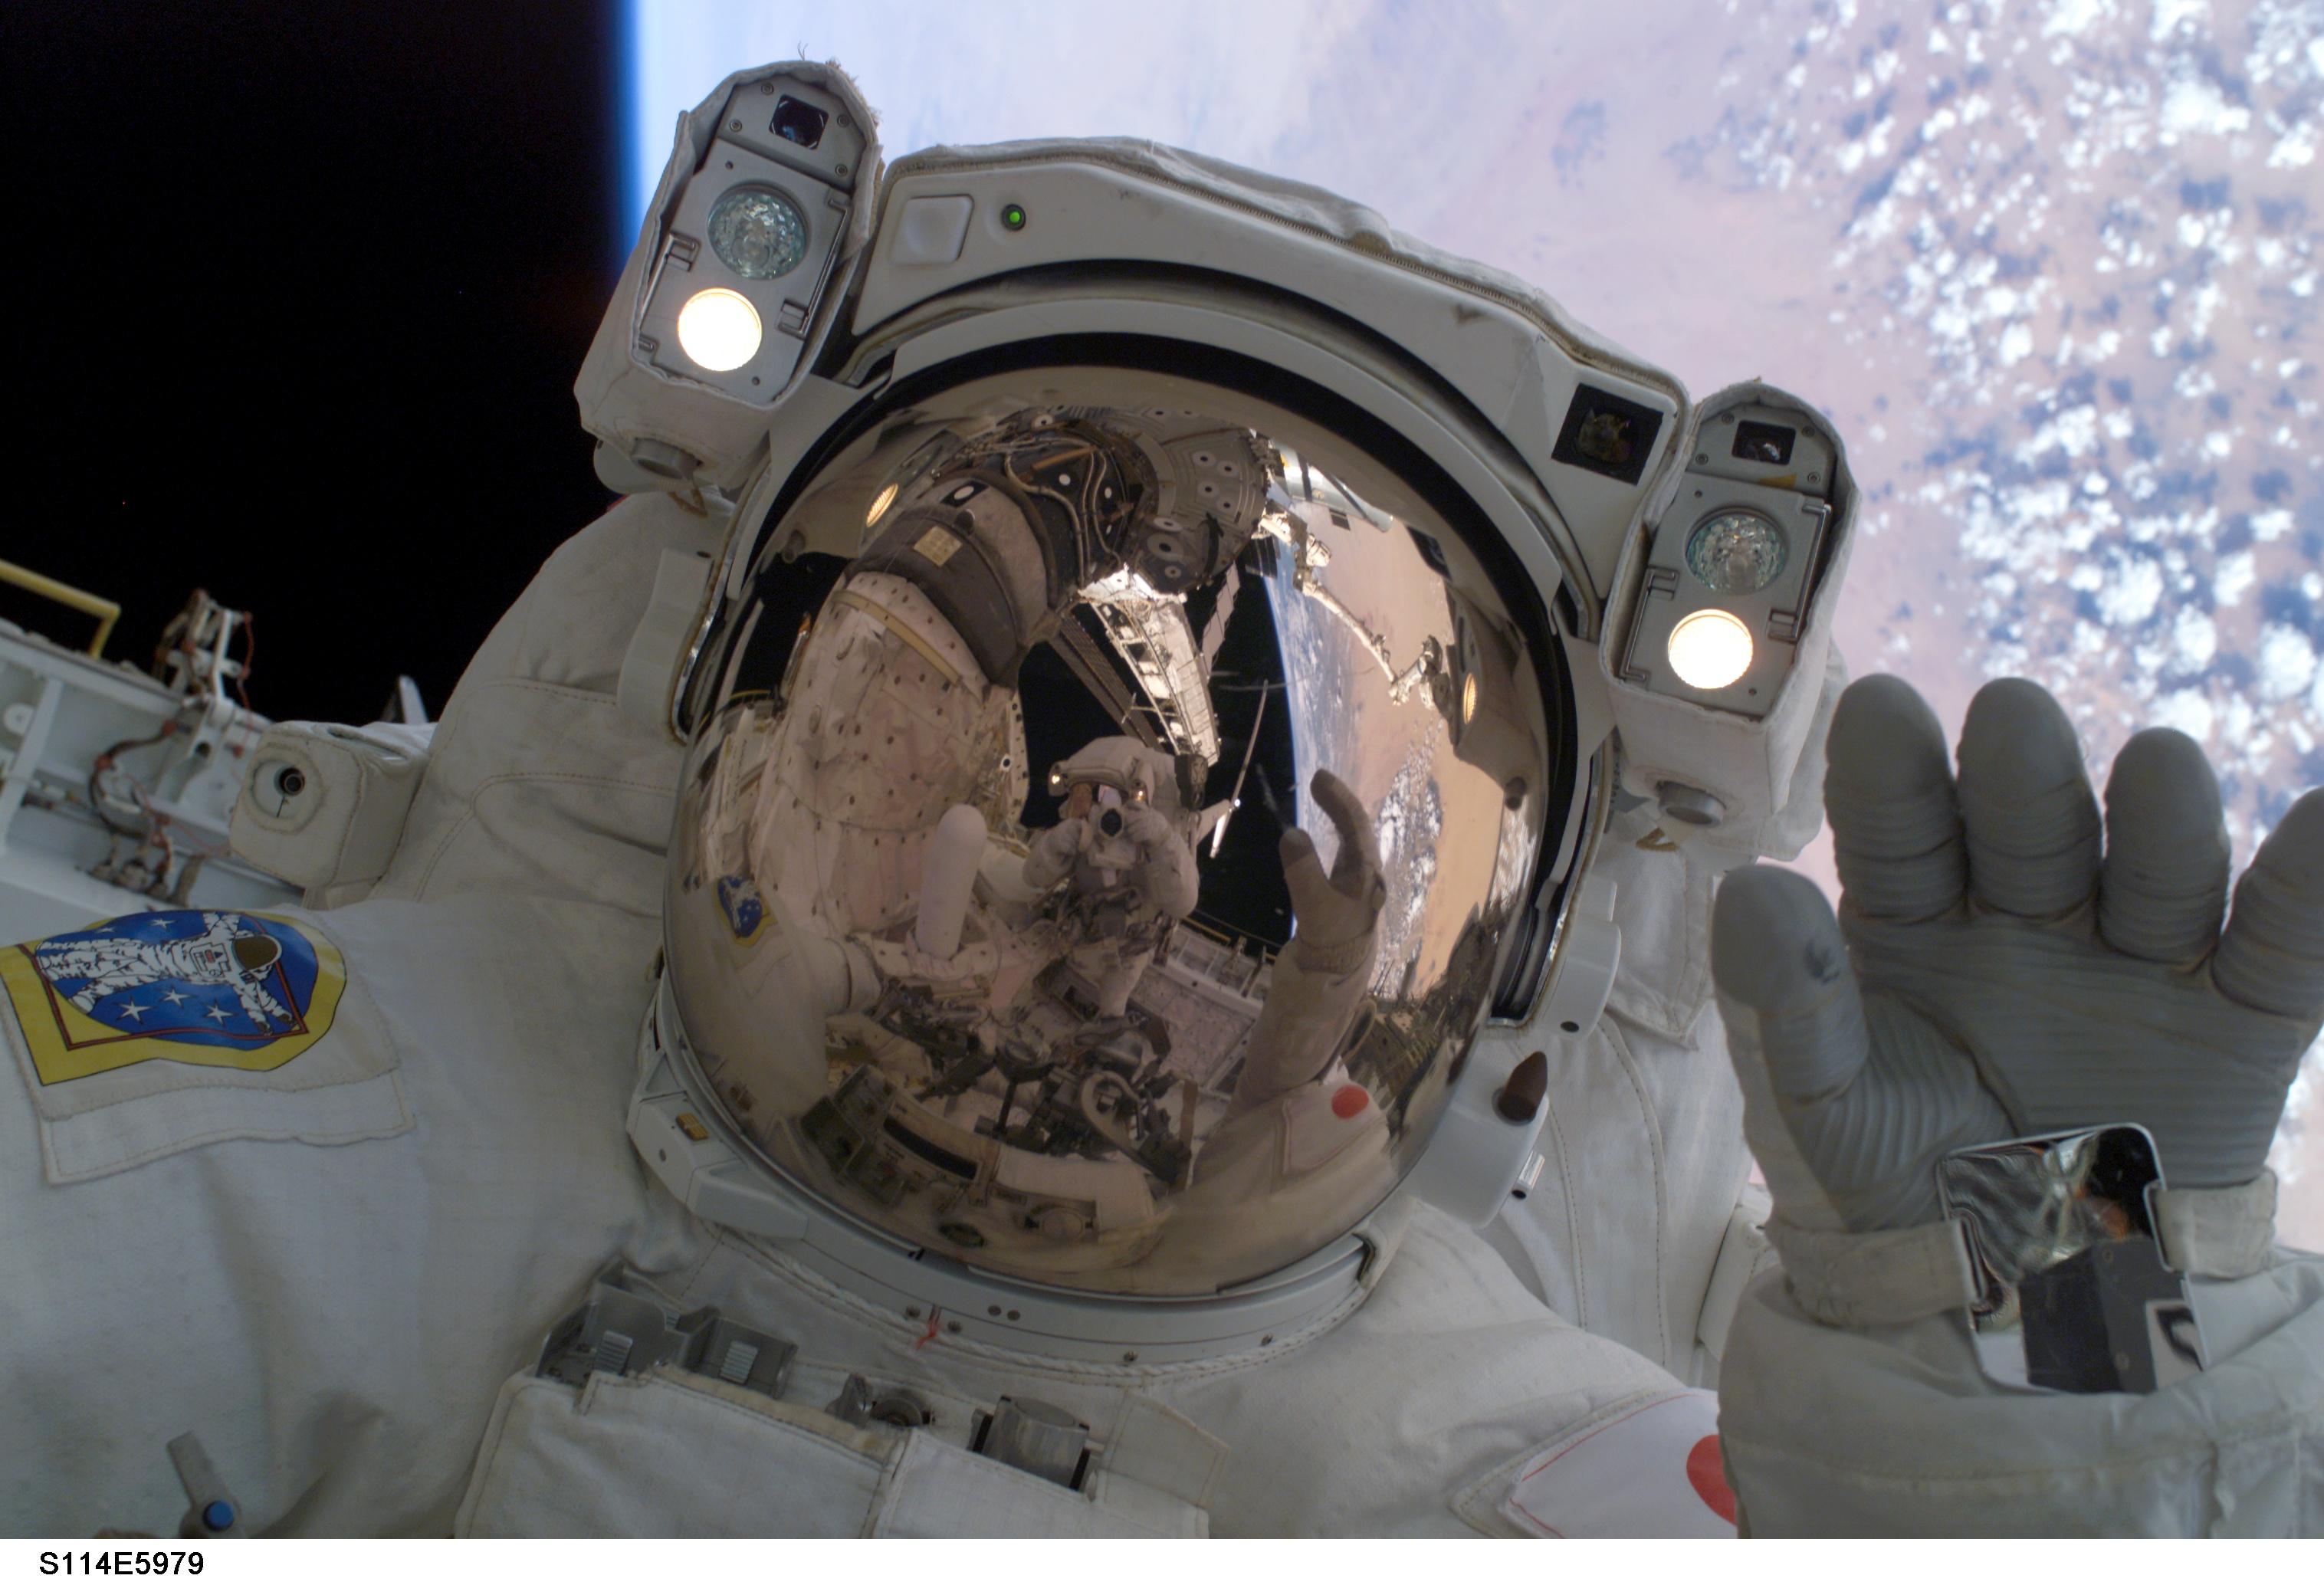 astronauts discovery - photo #32